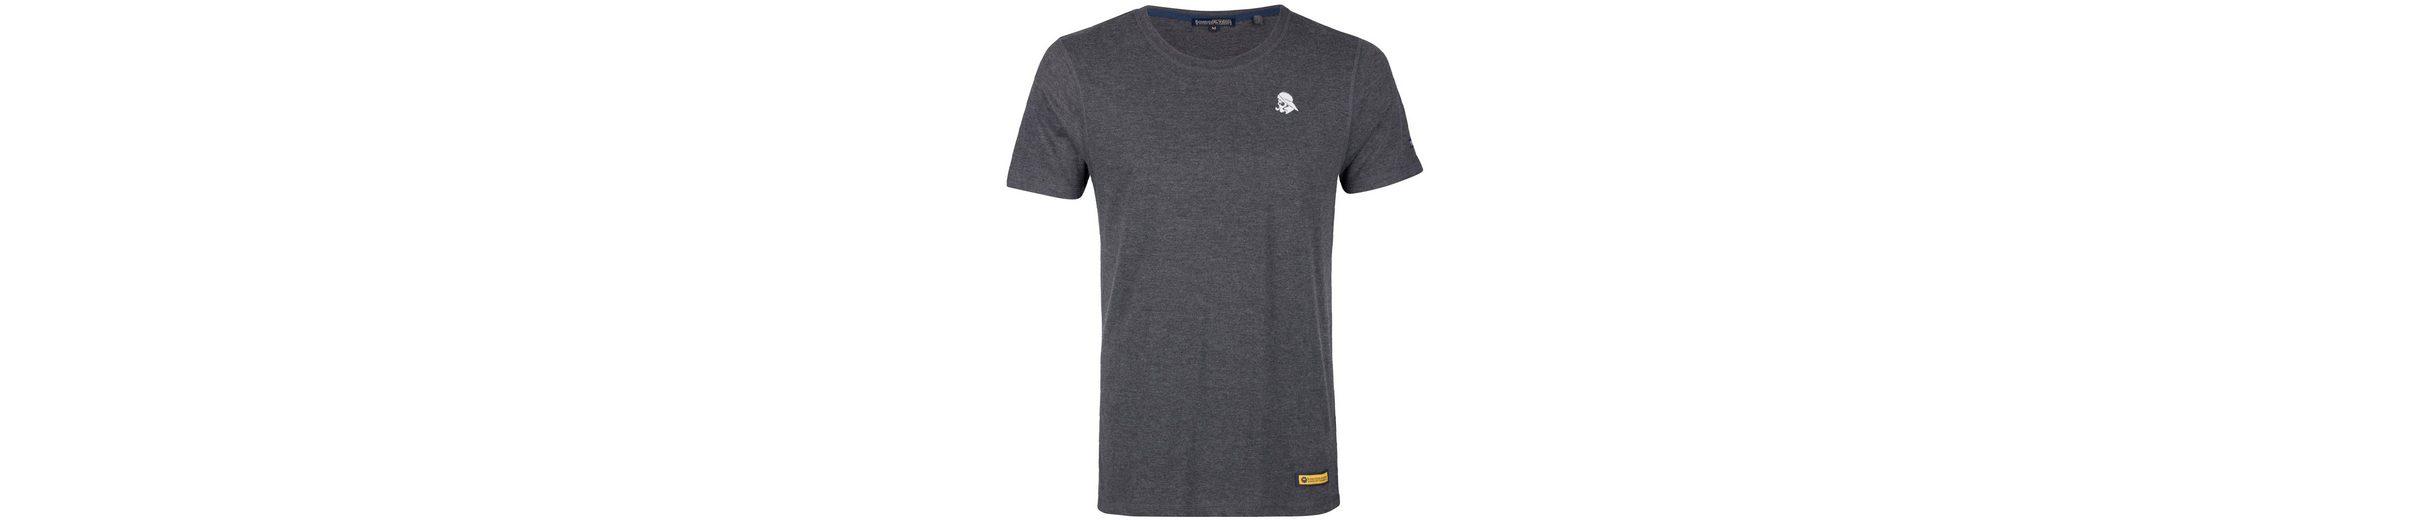 Nicekicks Zum Verkauf Schmuddelwedda T-Shirt Verkauf Ebay 9UQoS